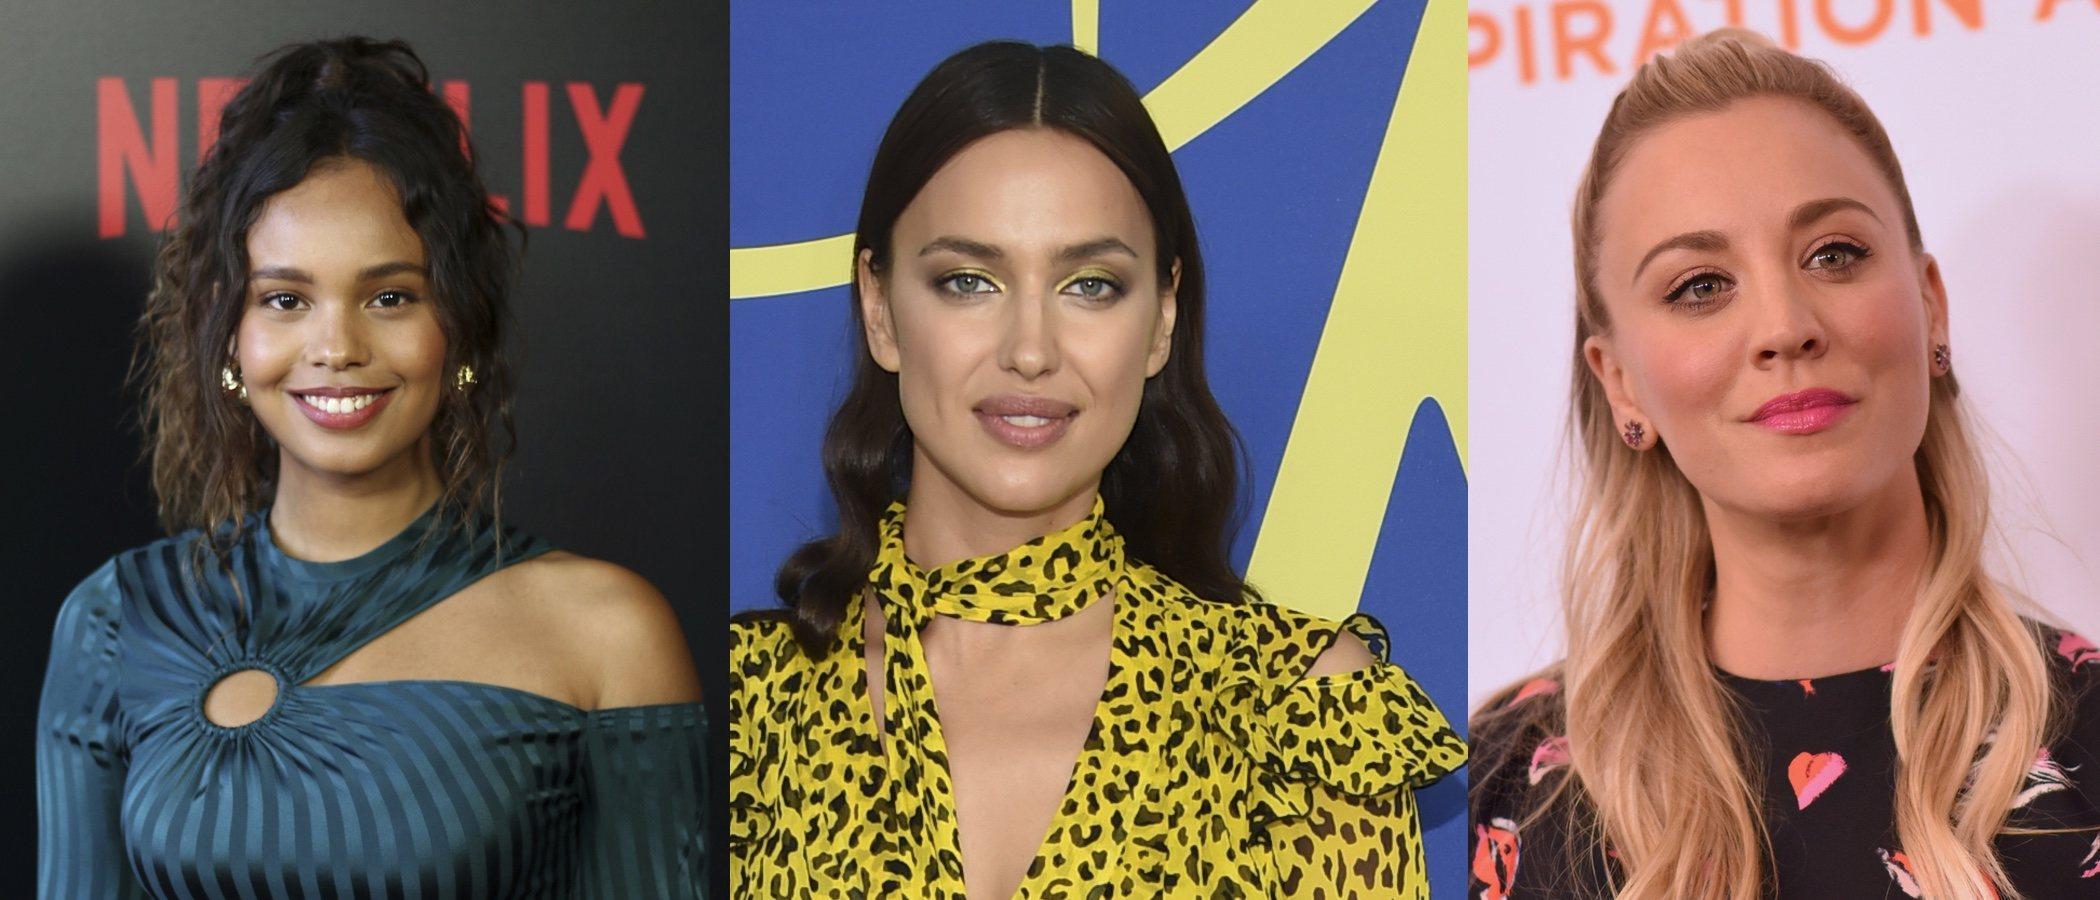 Kaley Cuoco, Alisha Boe e Irina Shayk entre los mejores beauty looks de la semana